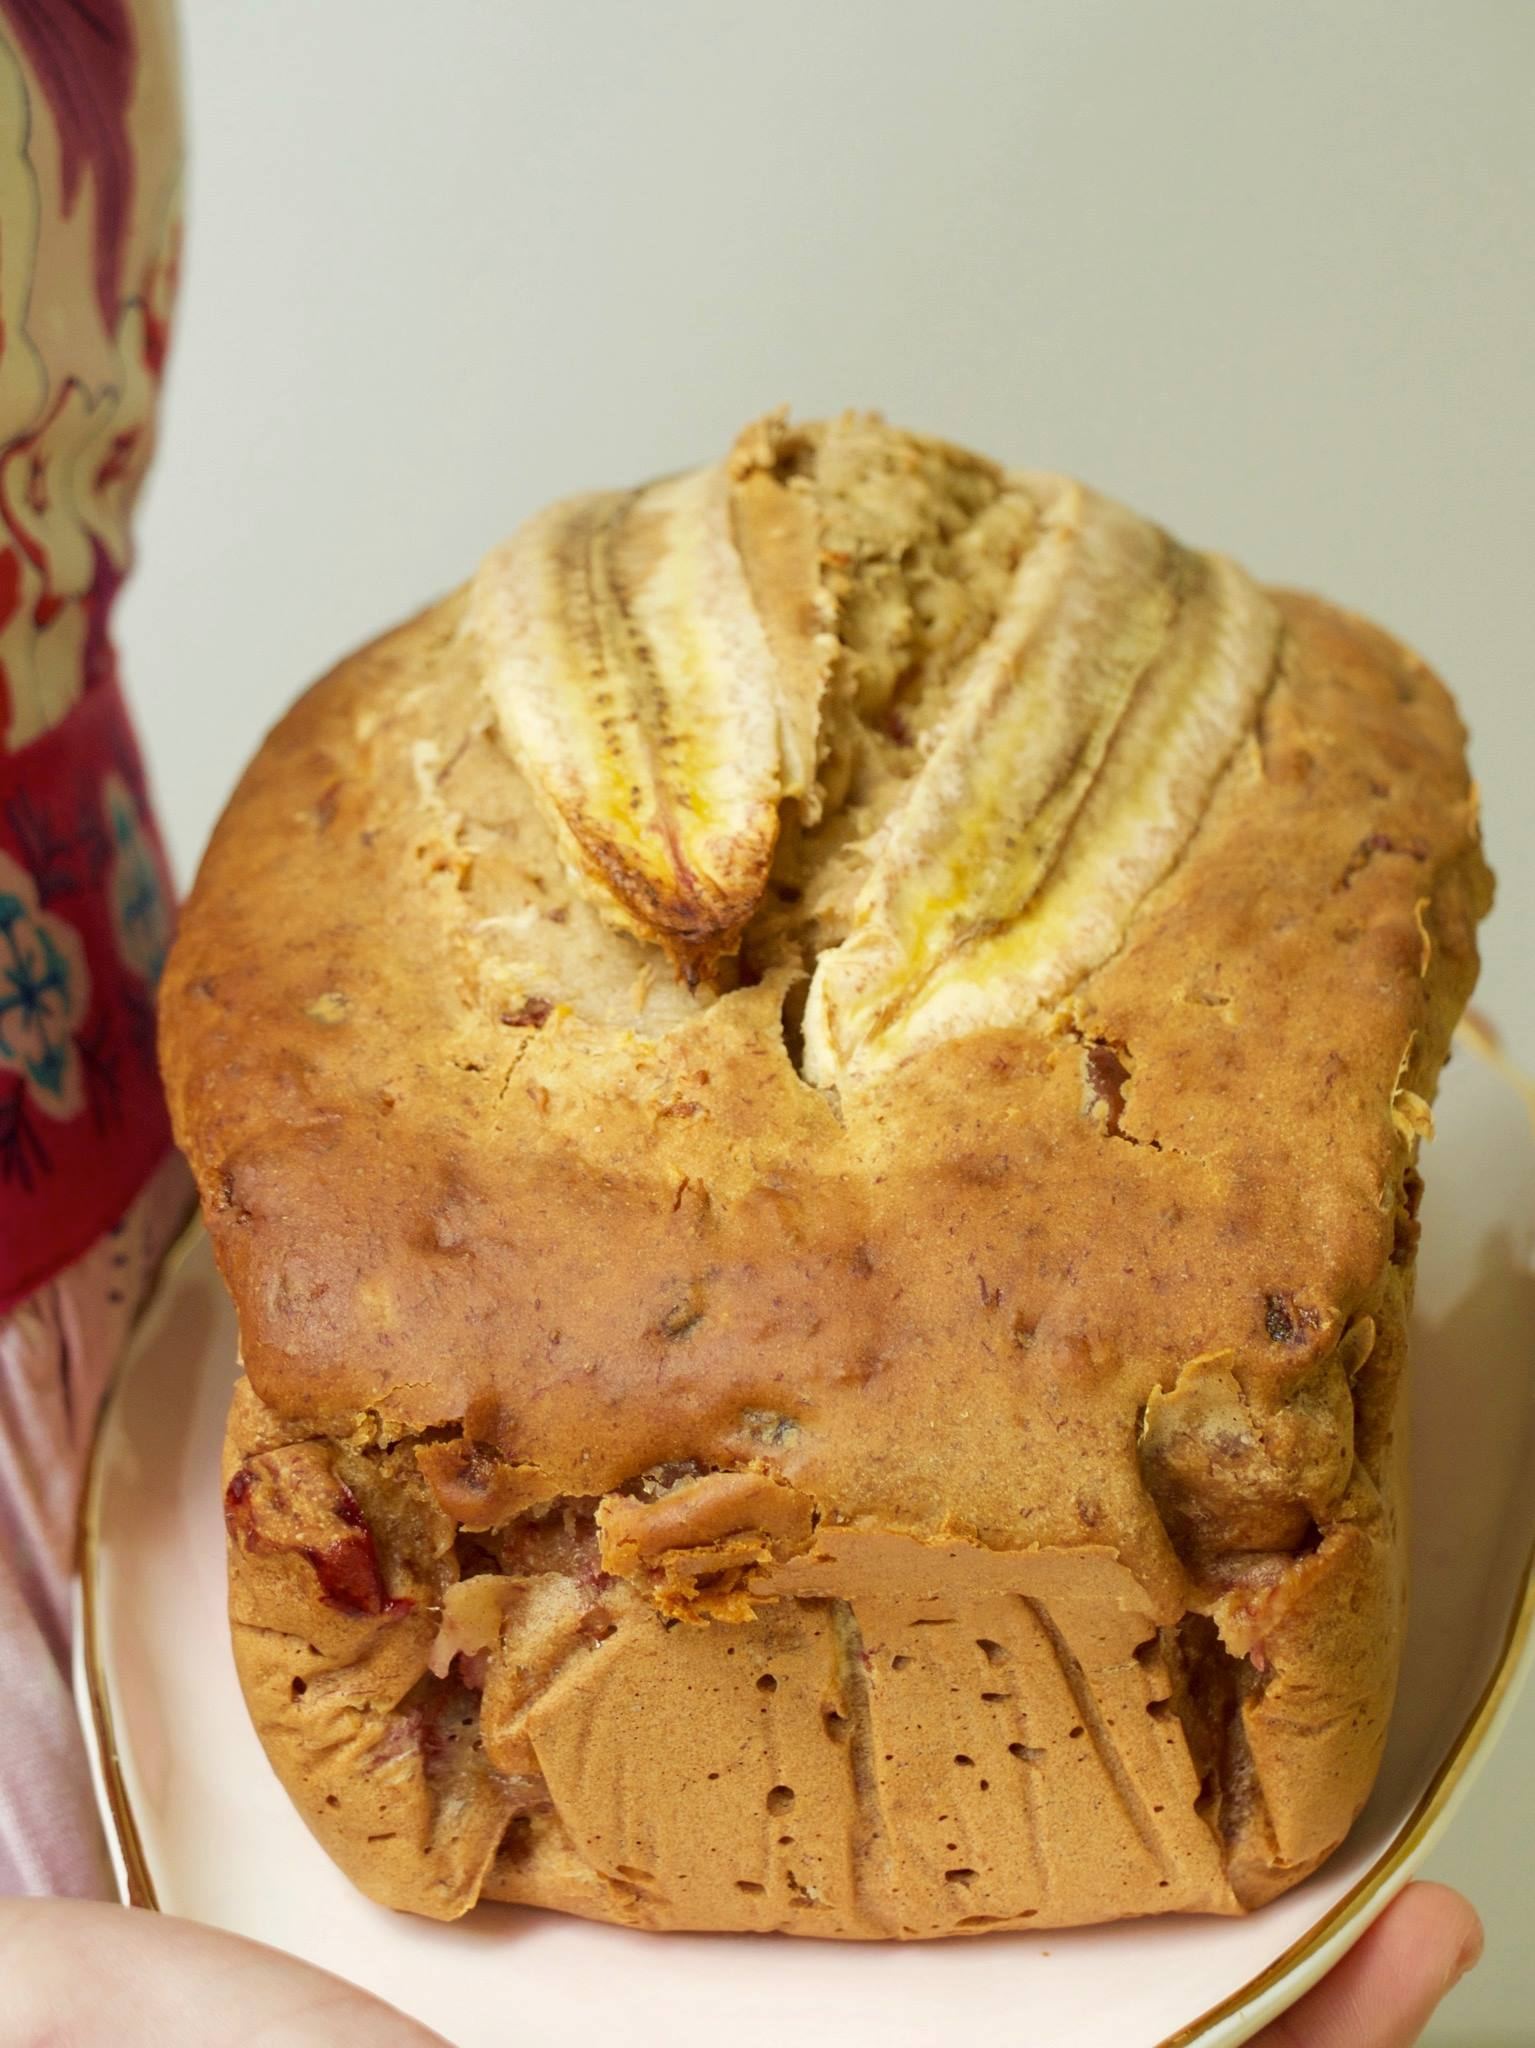 Date-Sweetened Banana Loaf